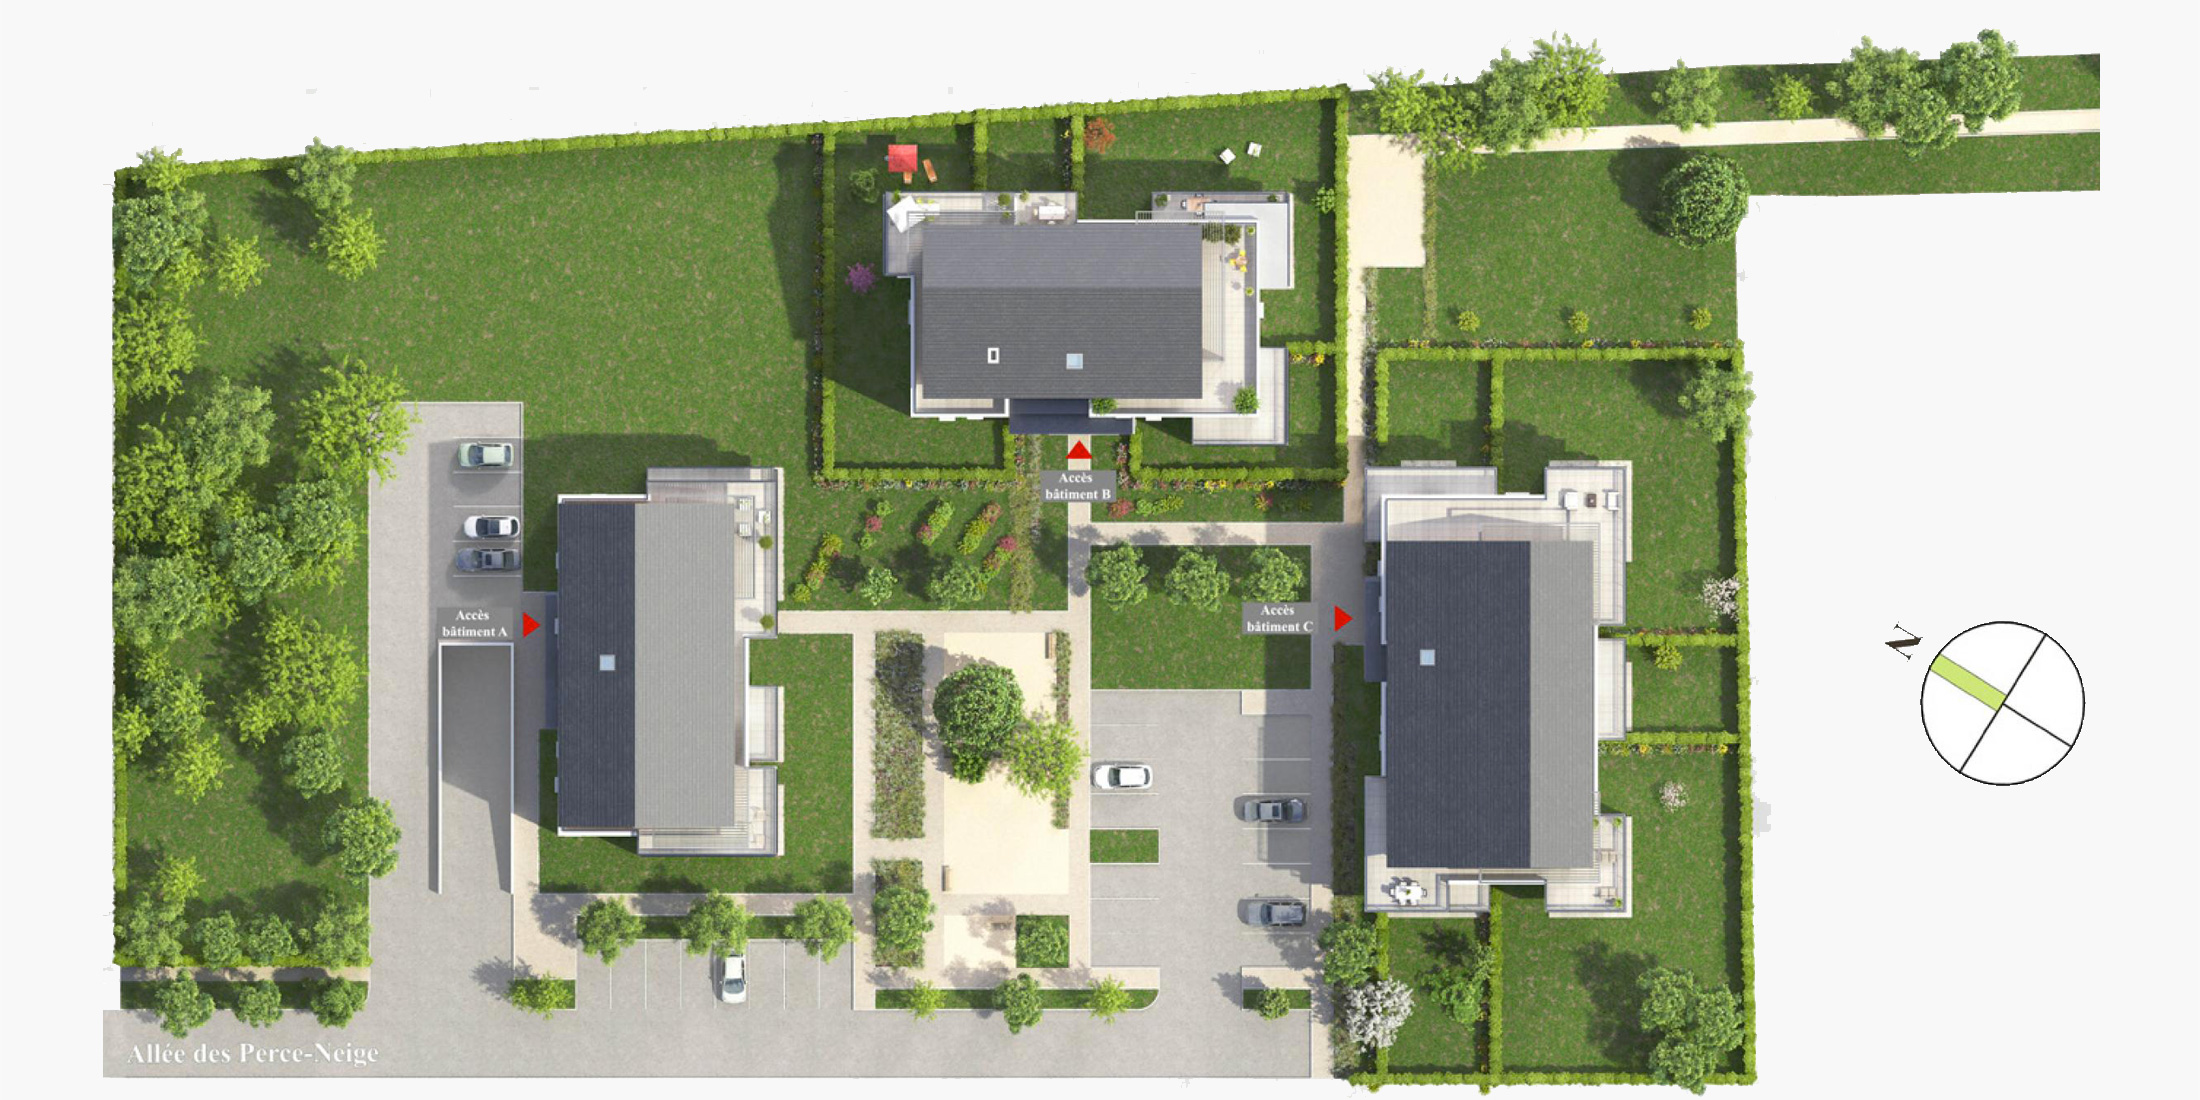 Plan maison jumelée, maison individuelle, garage, extension - Savoie Plan